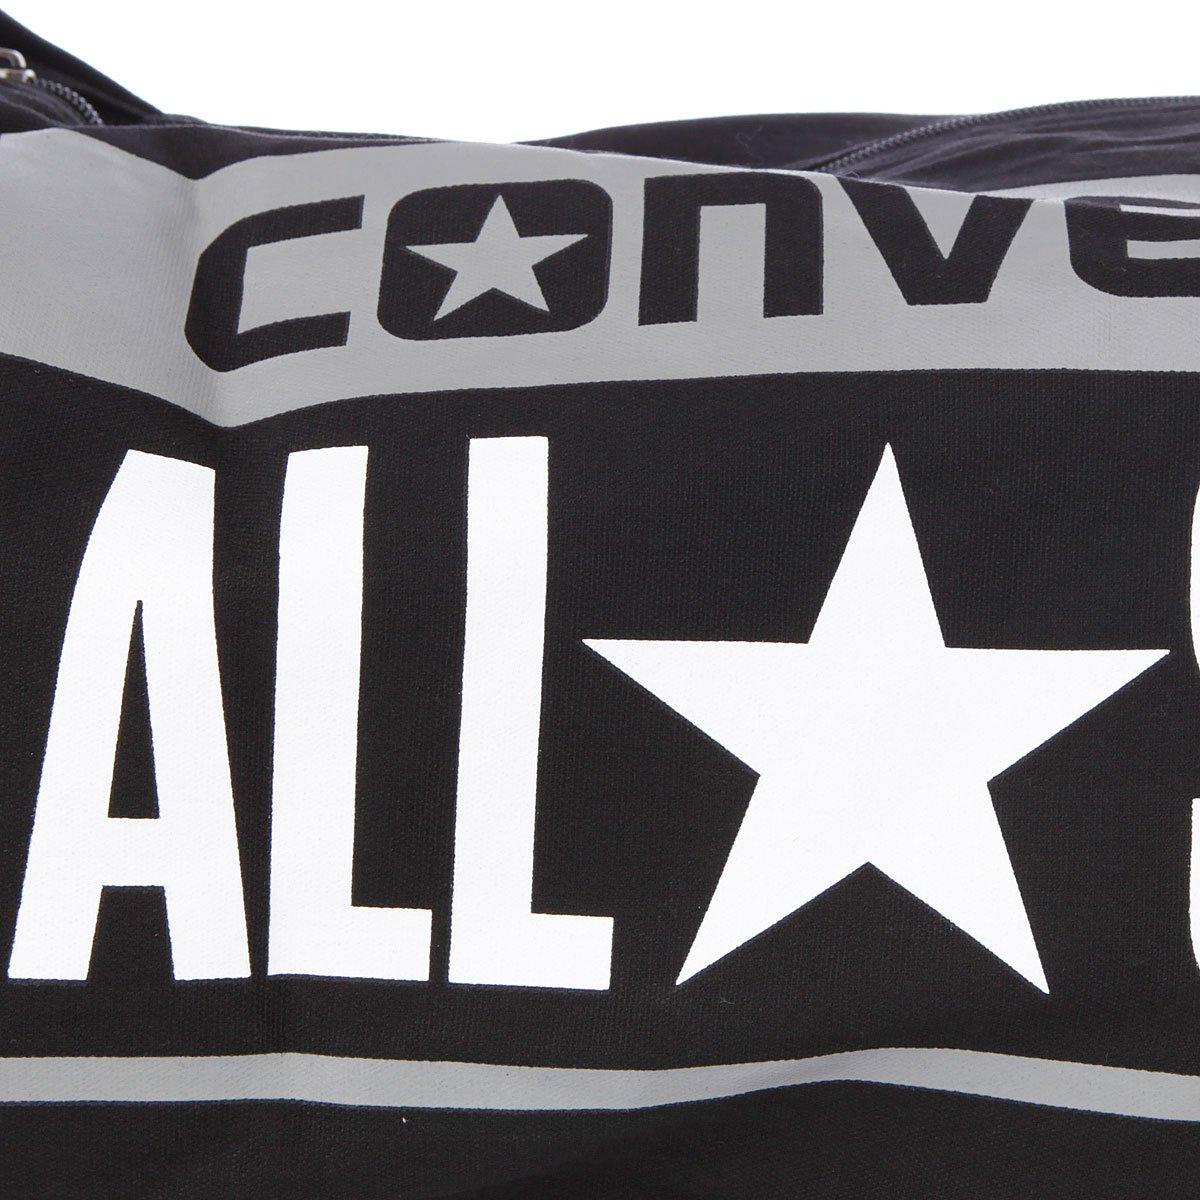 e621b74d29f0 Сумка Converse Legacy Duffel Black · Сумка Converse Legacy Duffel Black